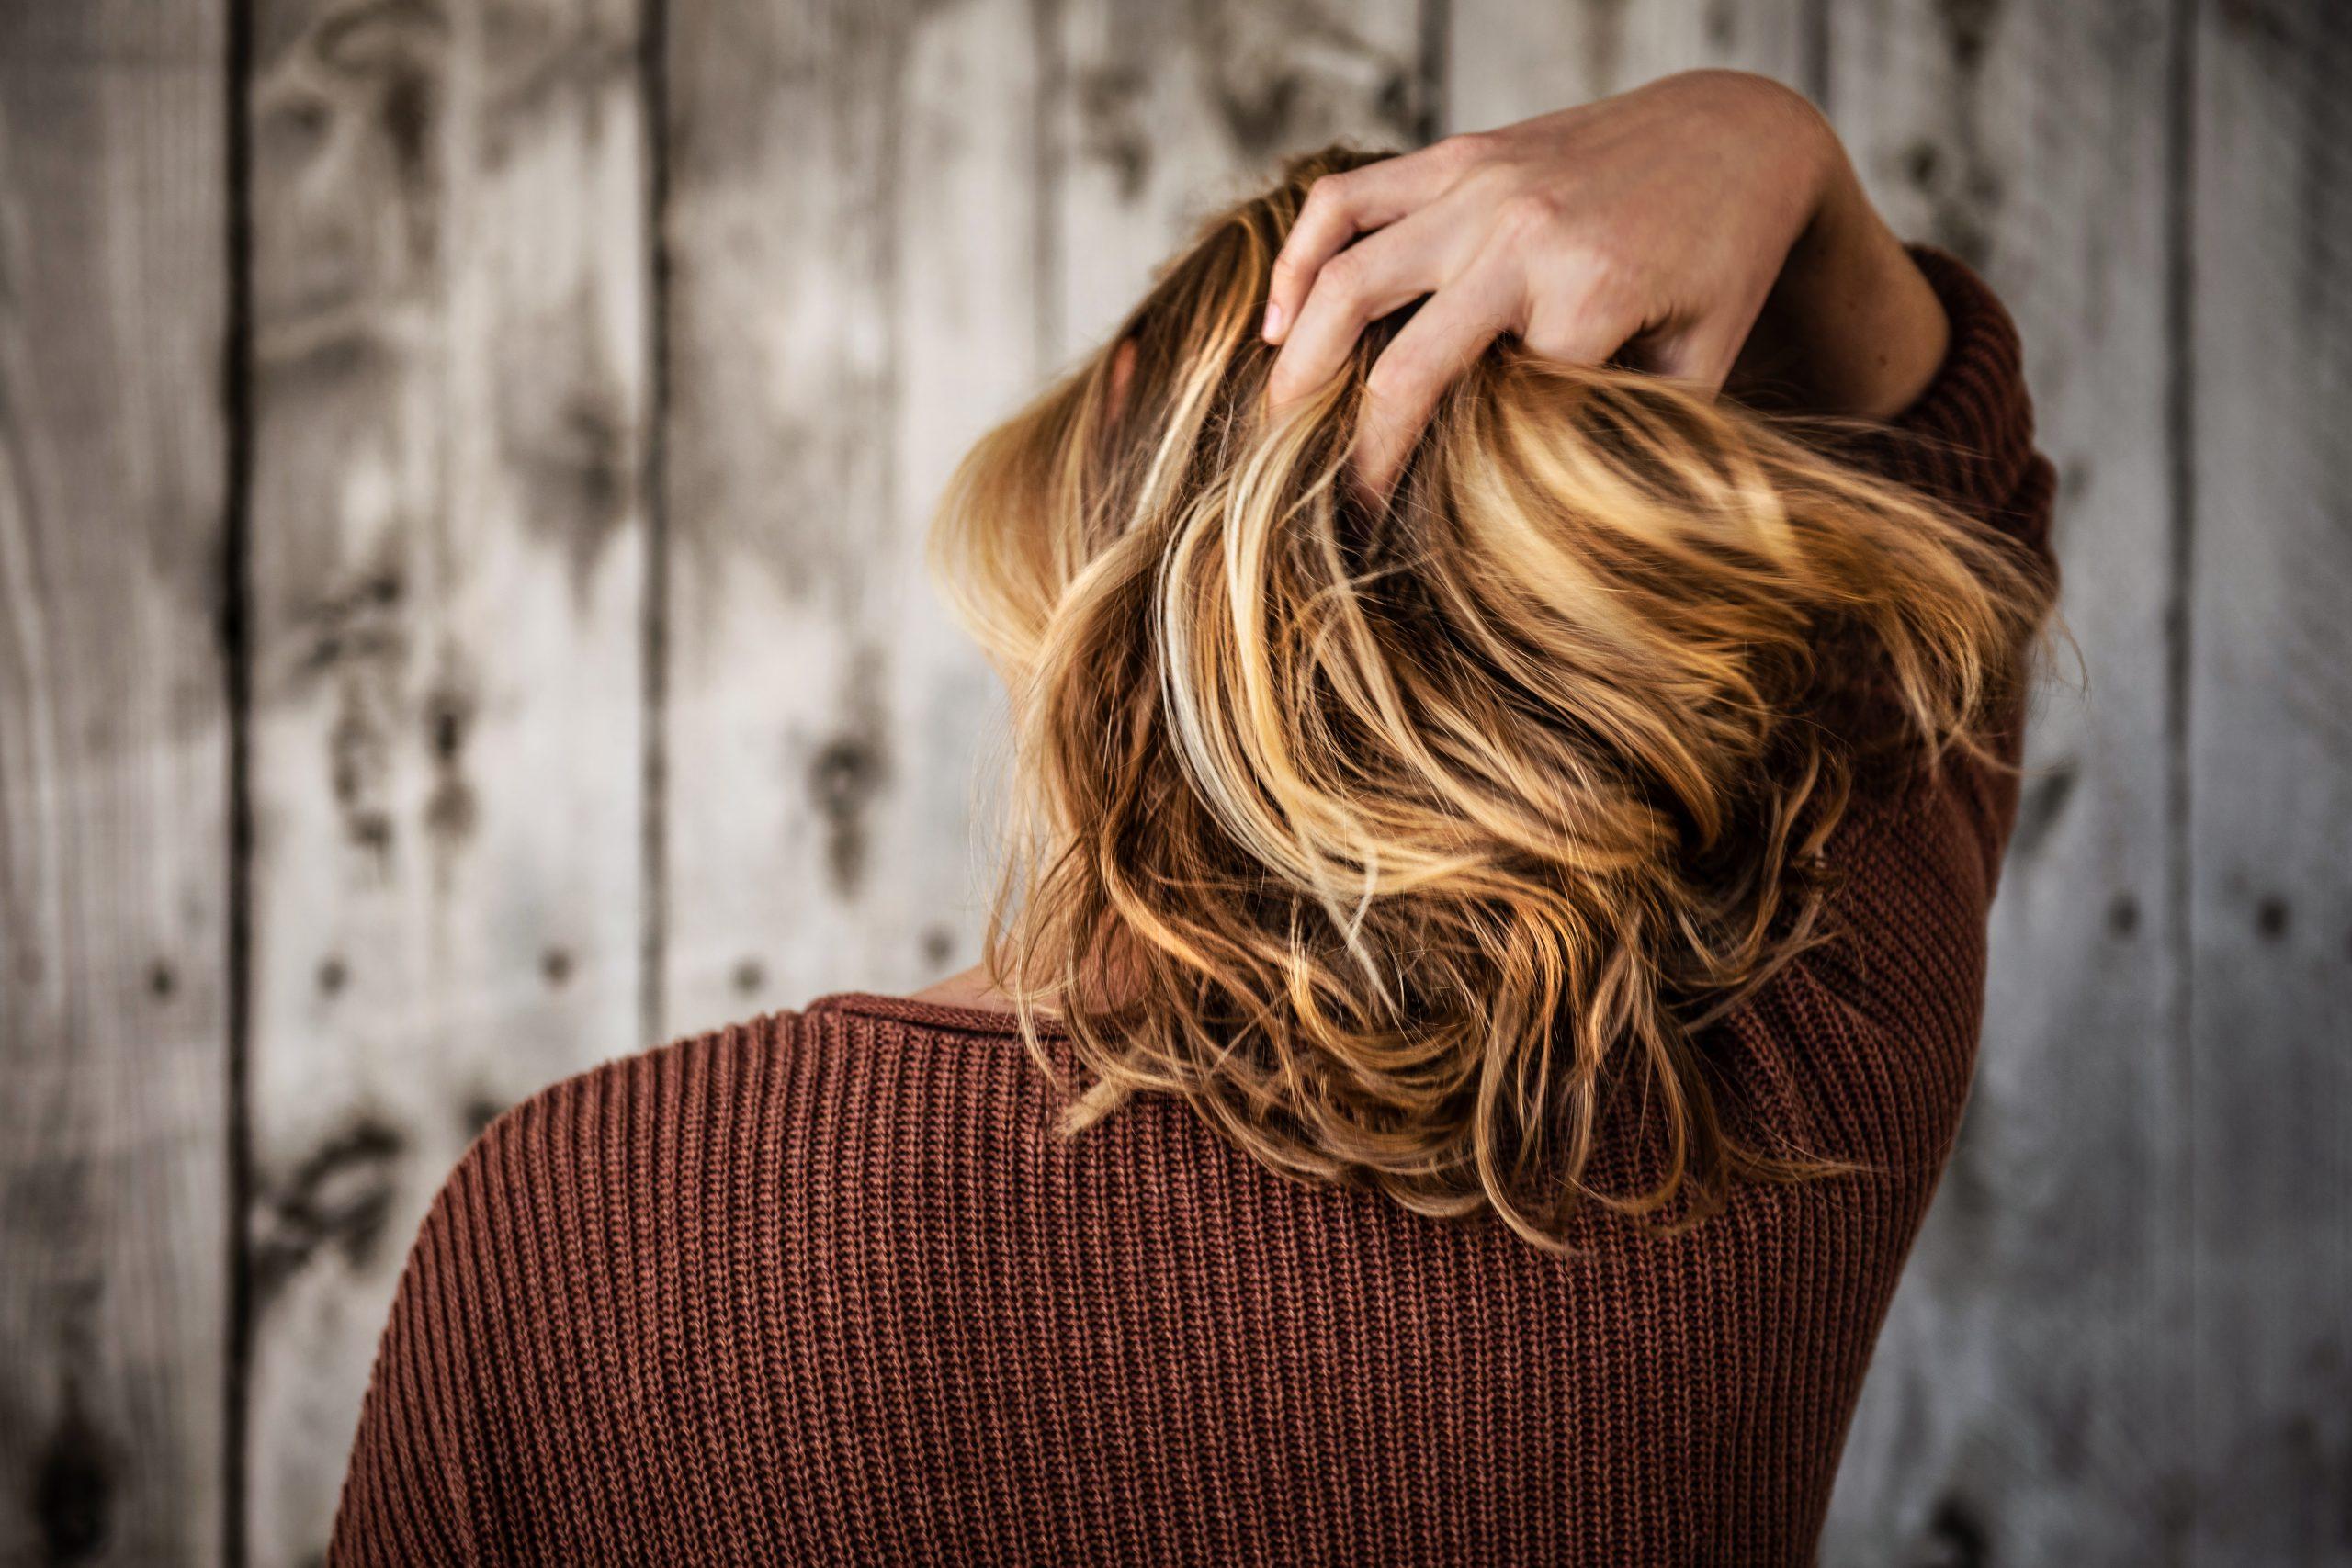 manje-poznati-simptomi-menopauze